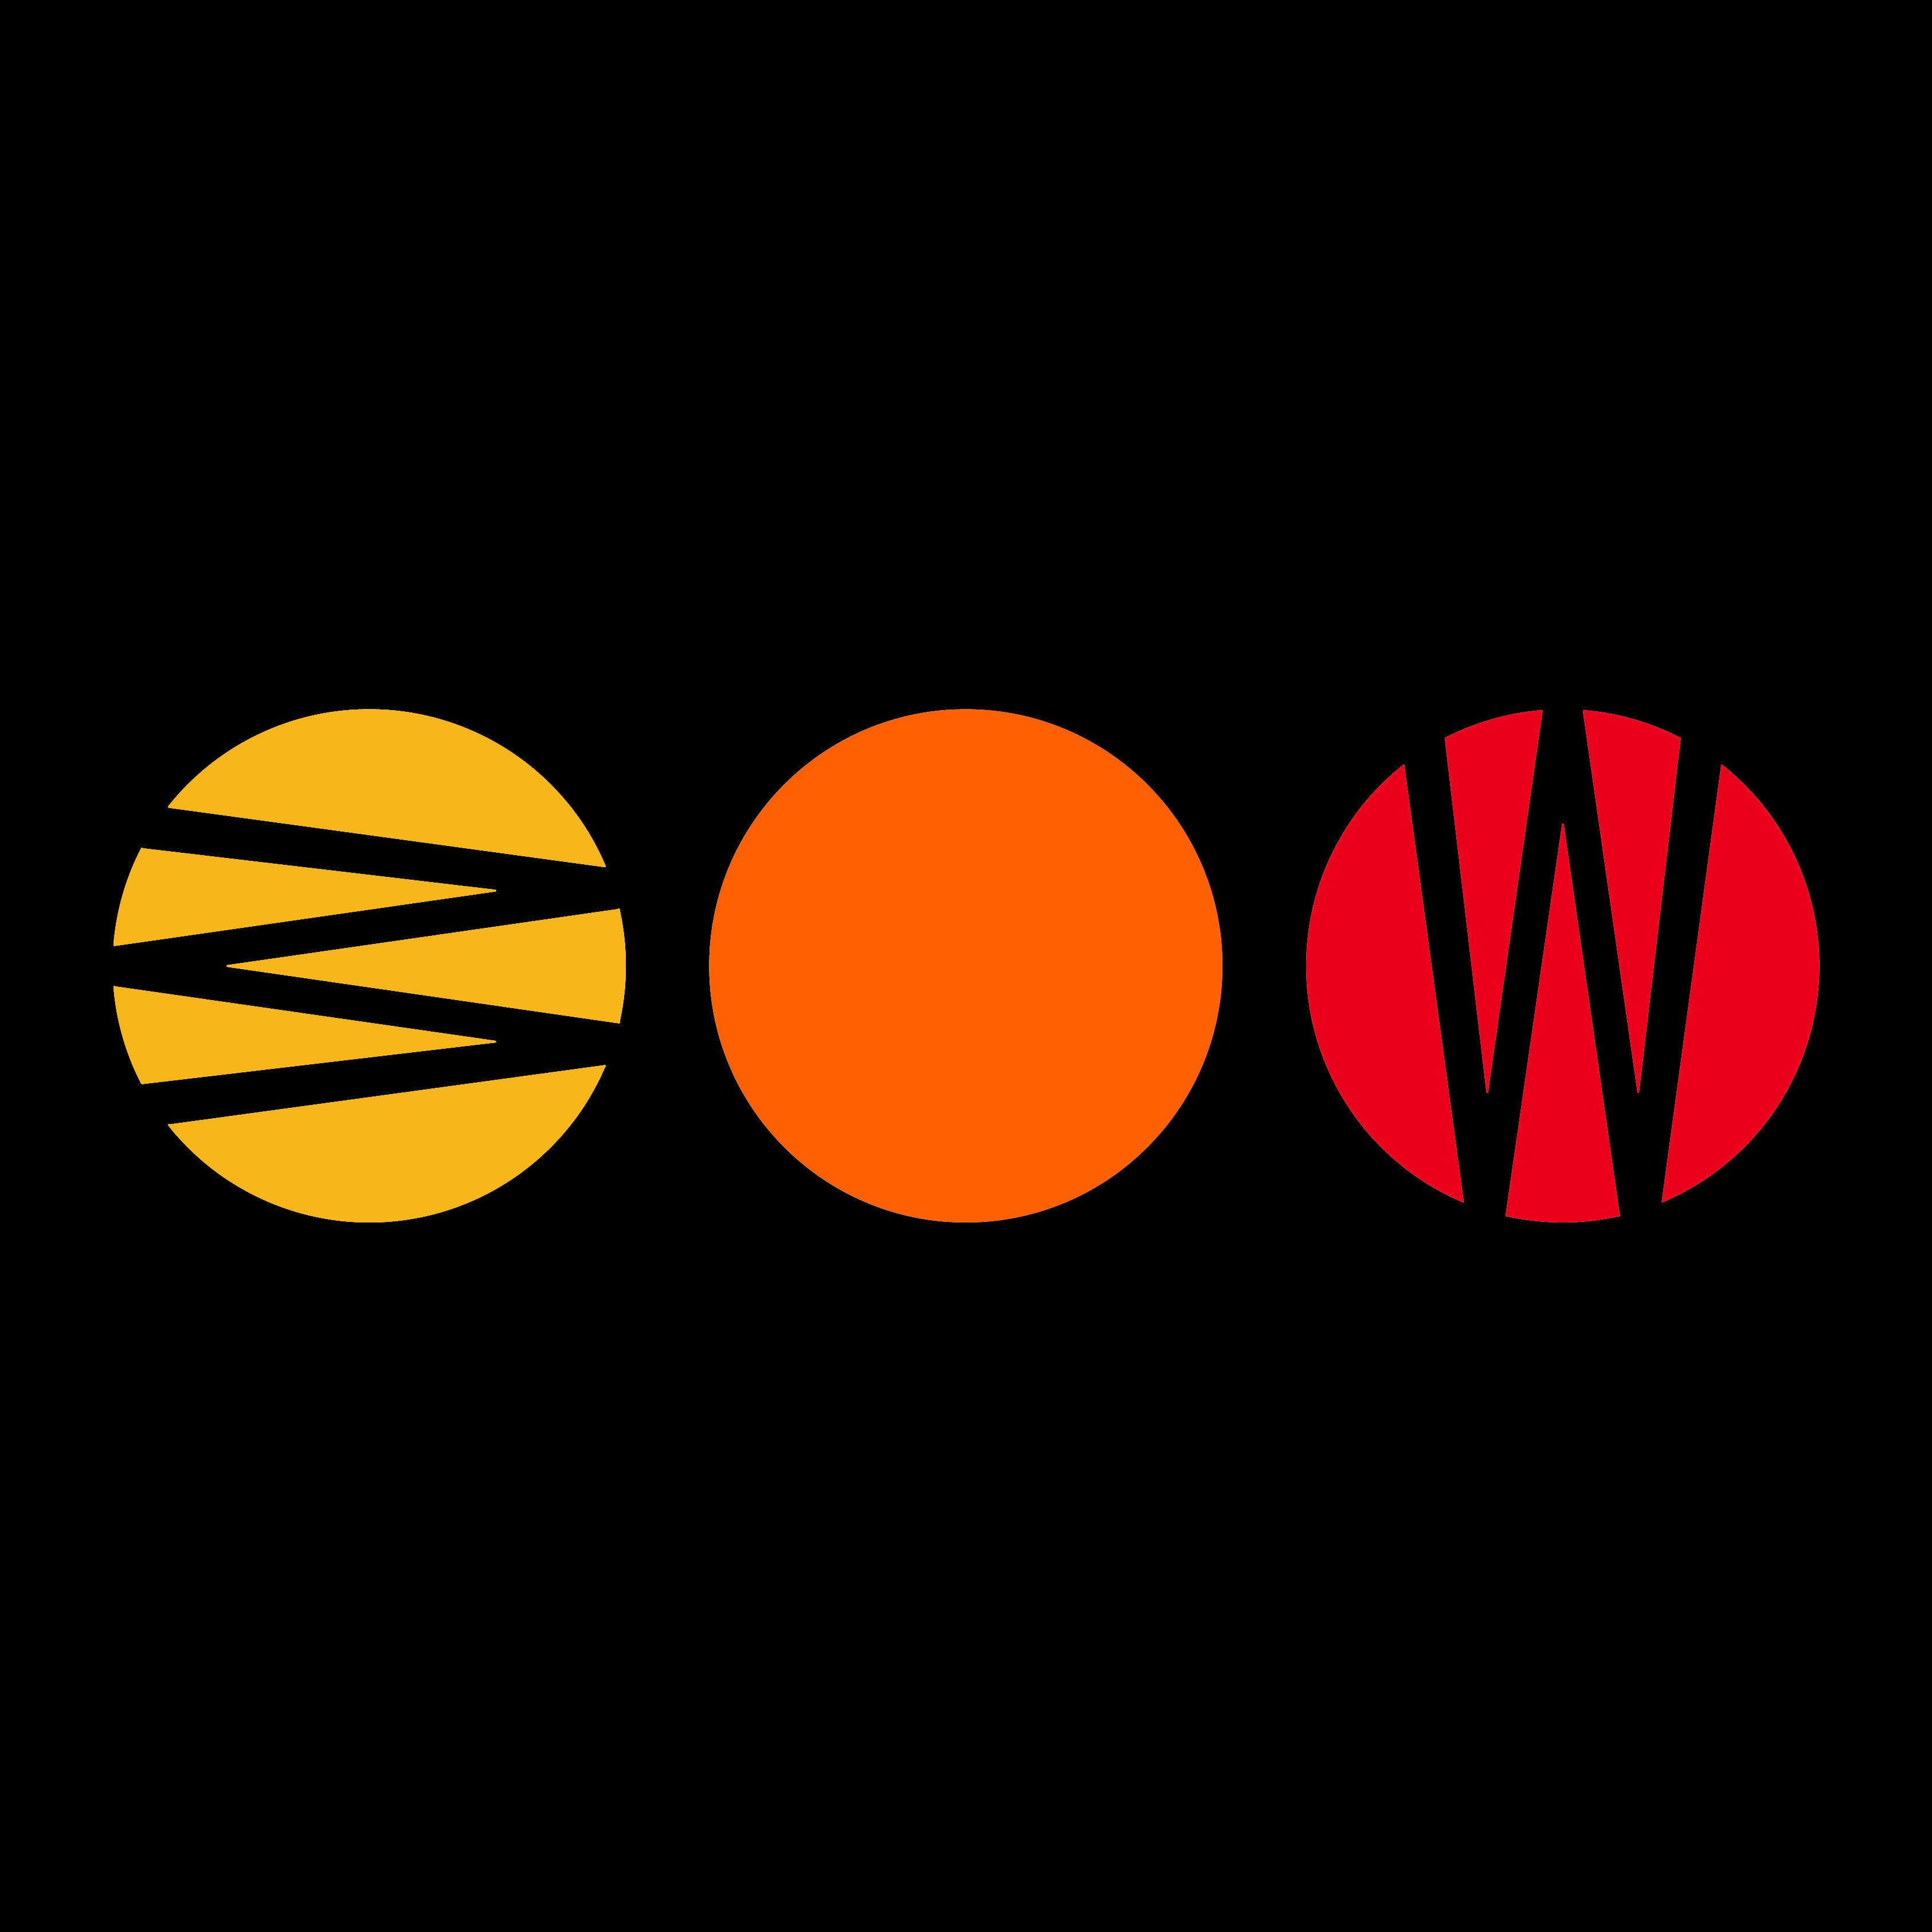 3dotWorks